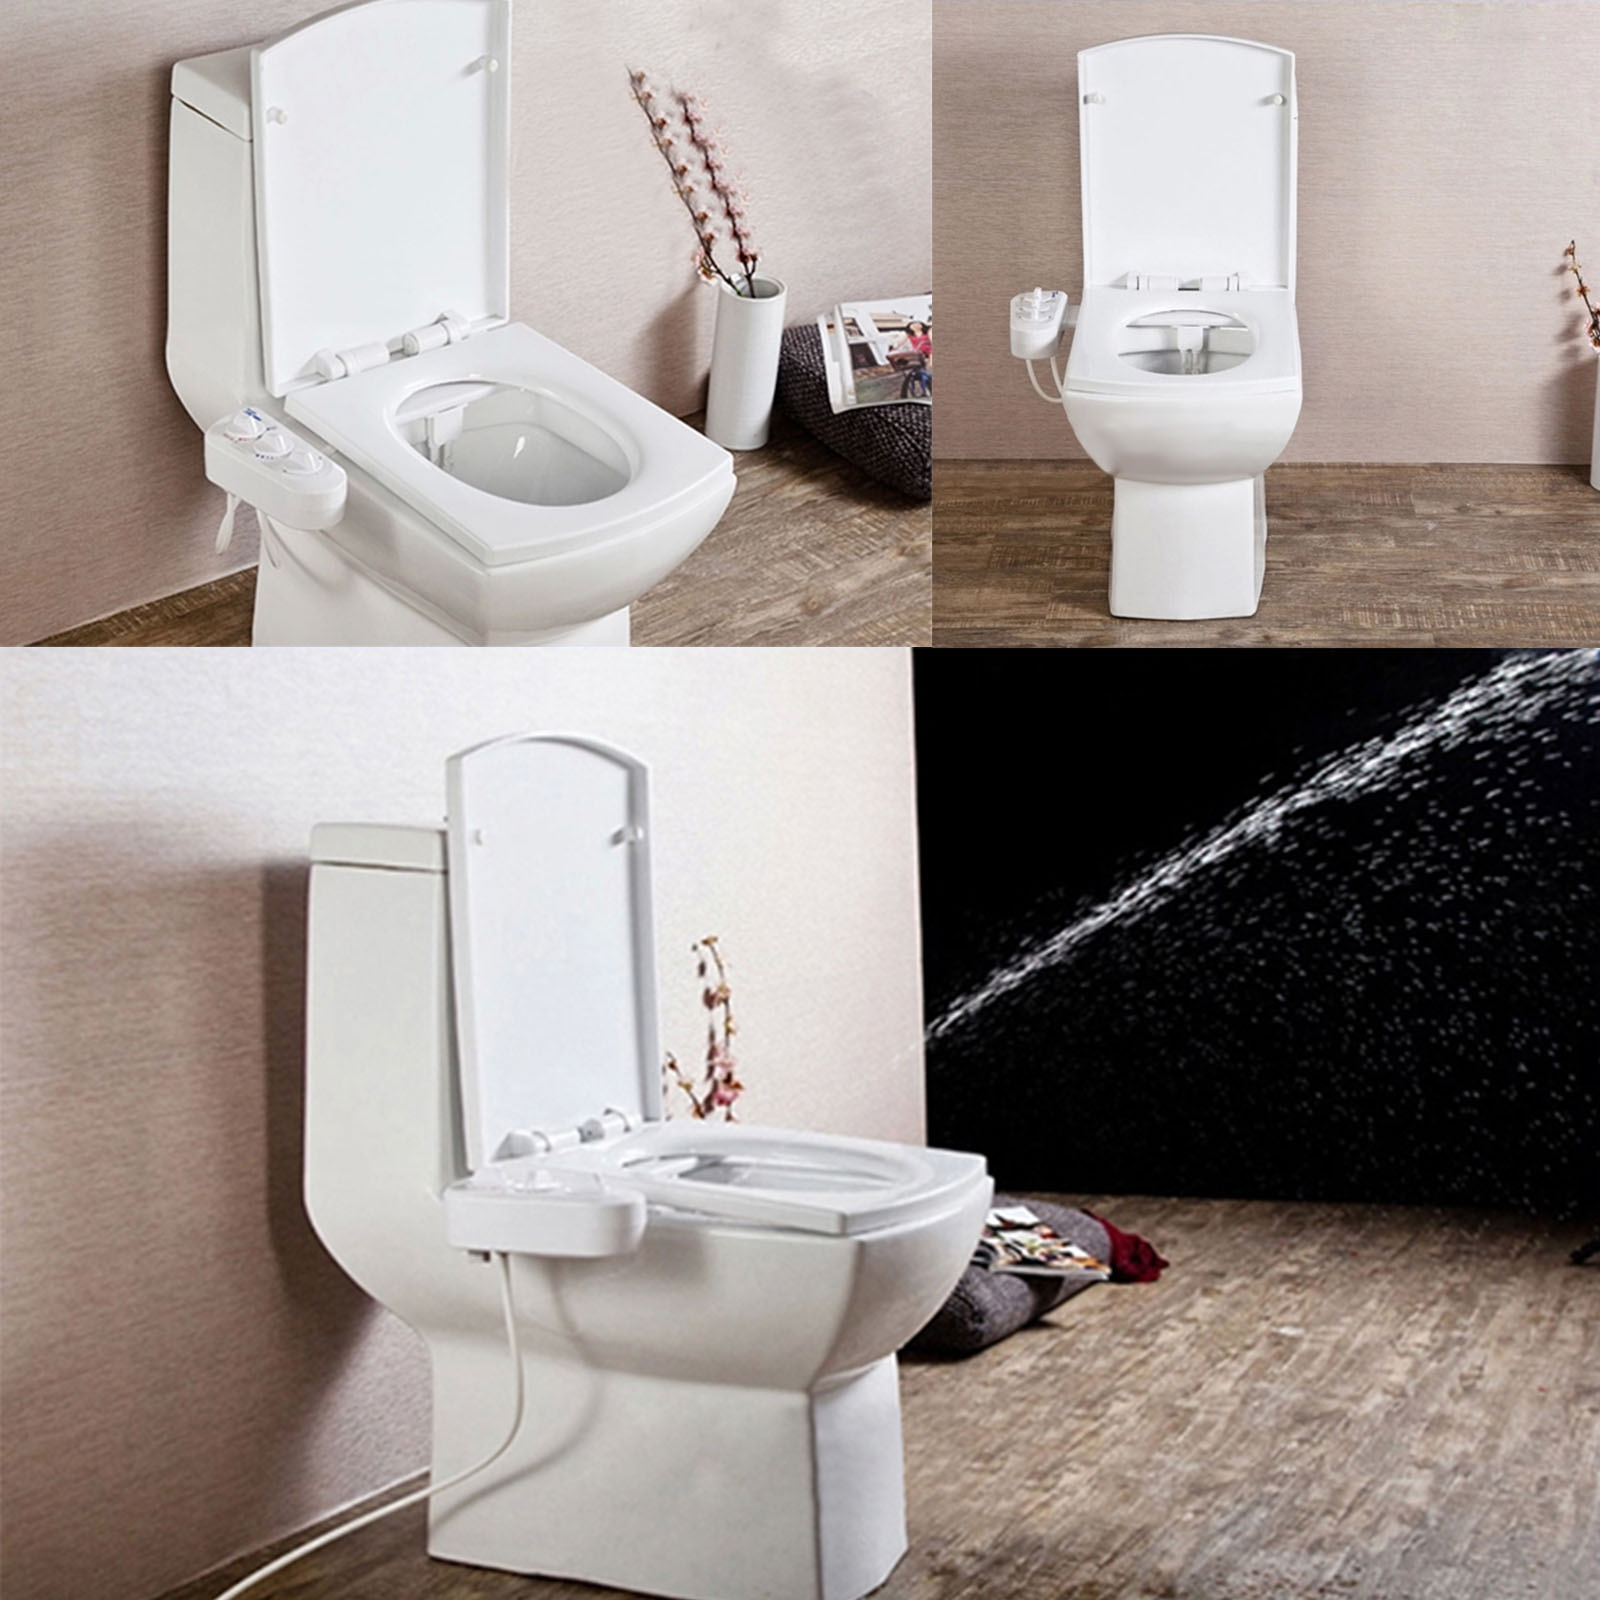 paladino bidet elongated bathroom piece toilet white one dual flush